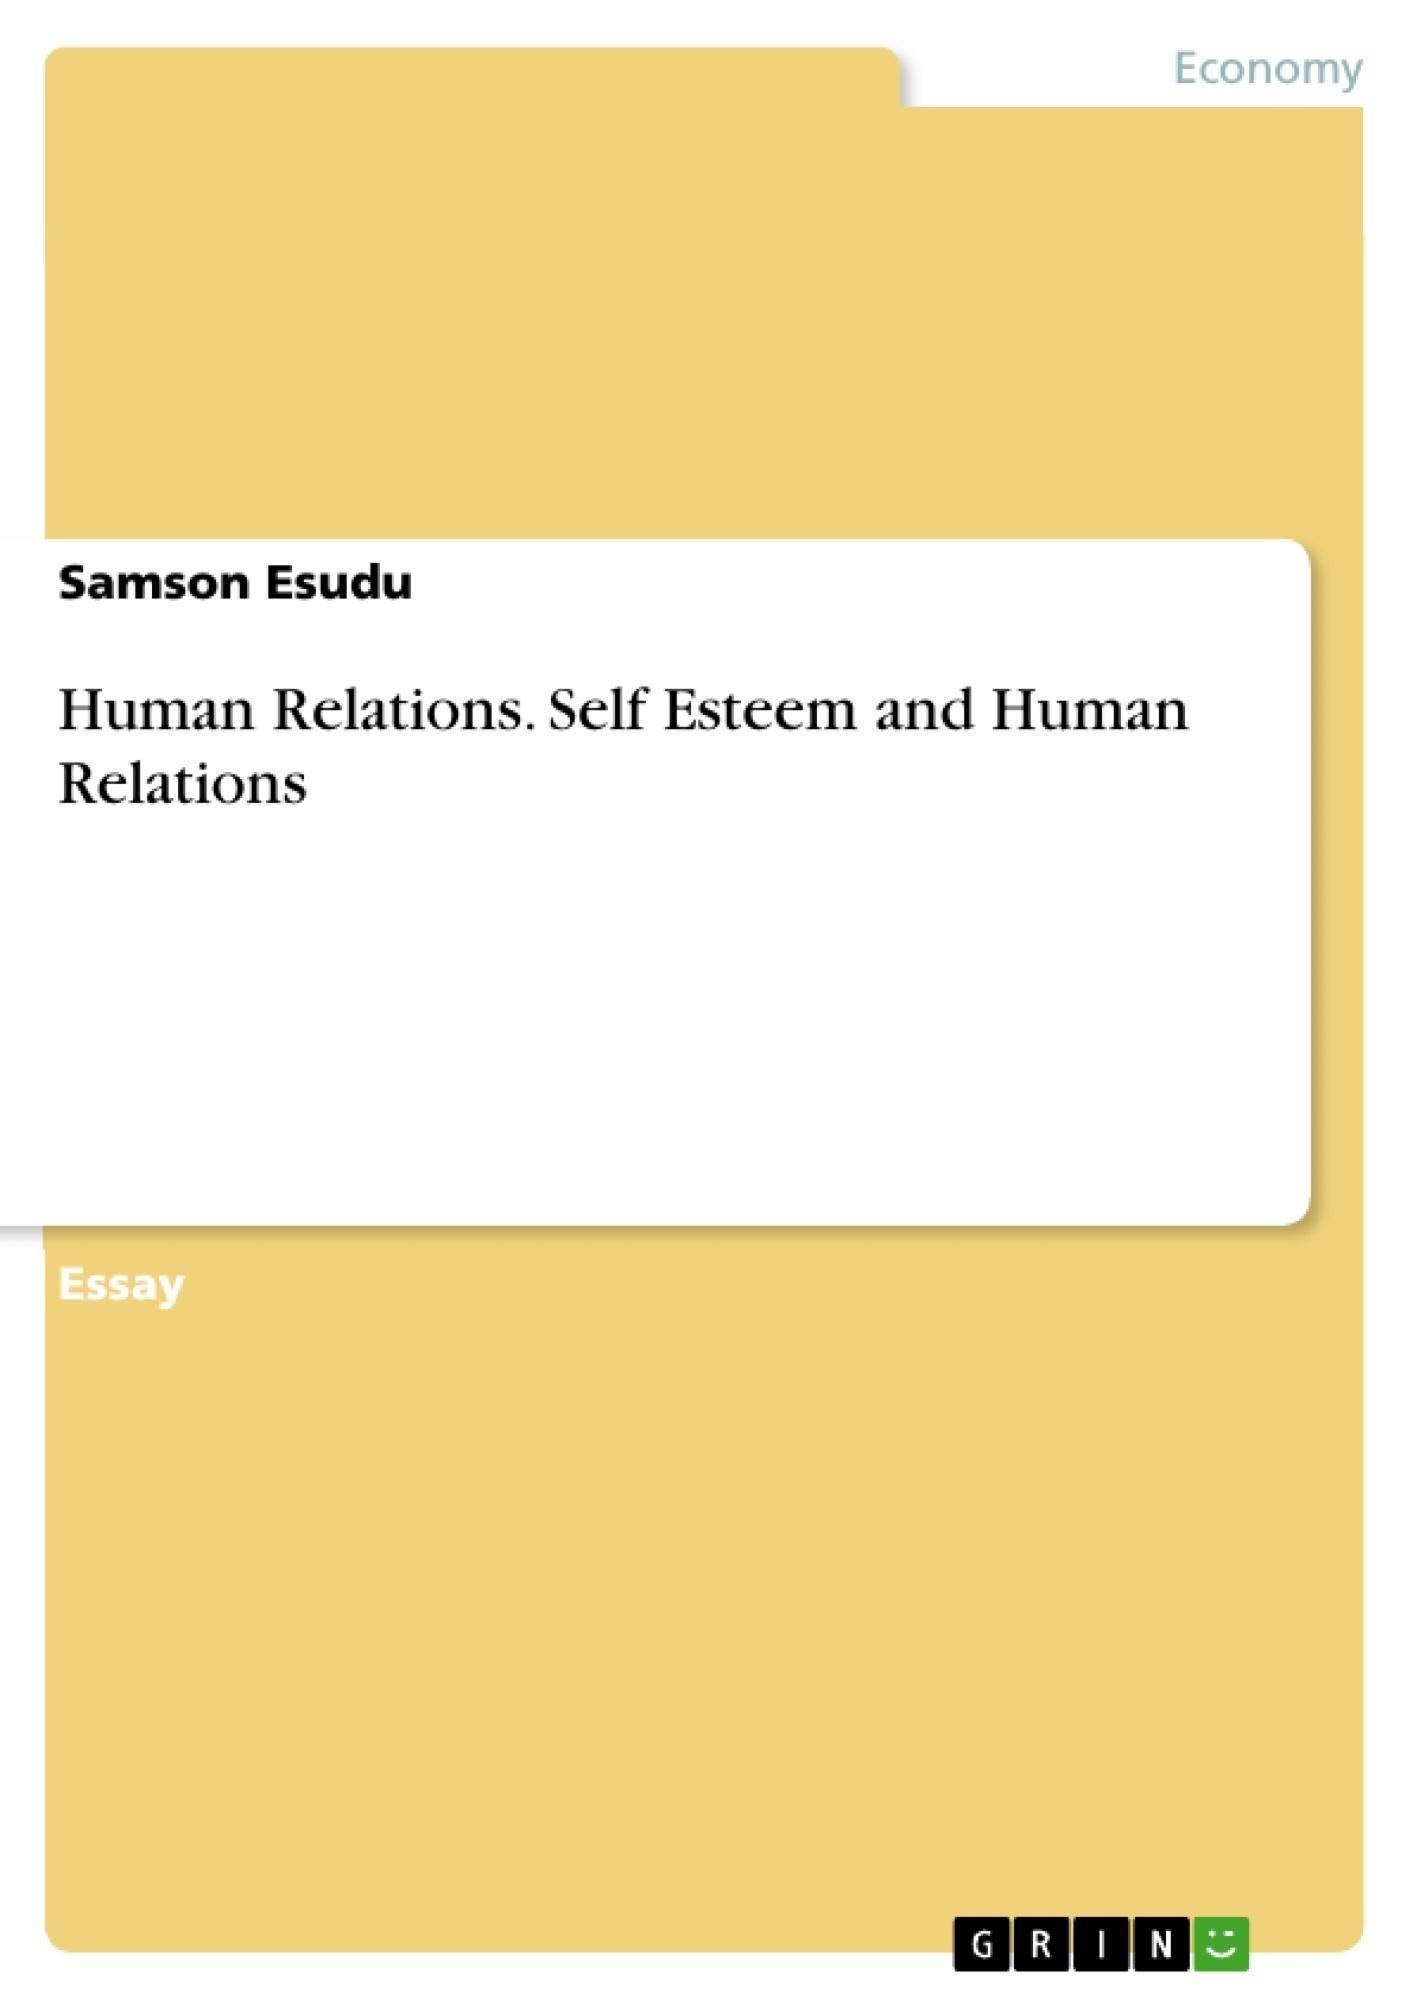 014 334341 0 Essay Example Self Wondrous Esteem Conclusion Wikipedia Full